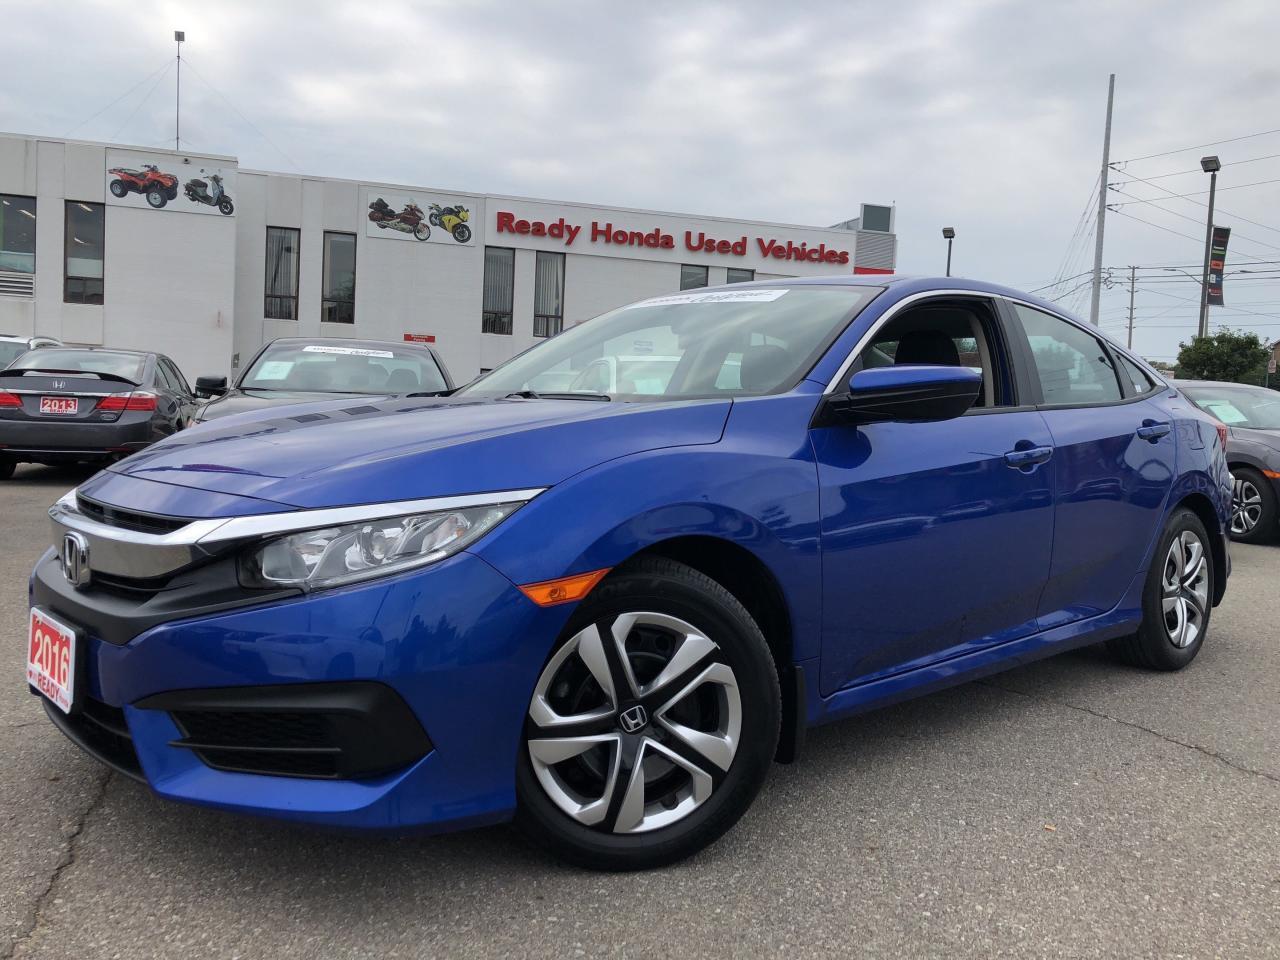 2016 Honda Civic Sedan LX - Bluetooth - Rear Camera - Heated Seats